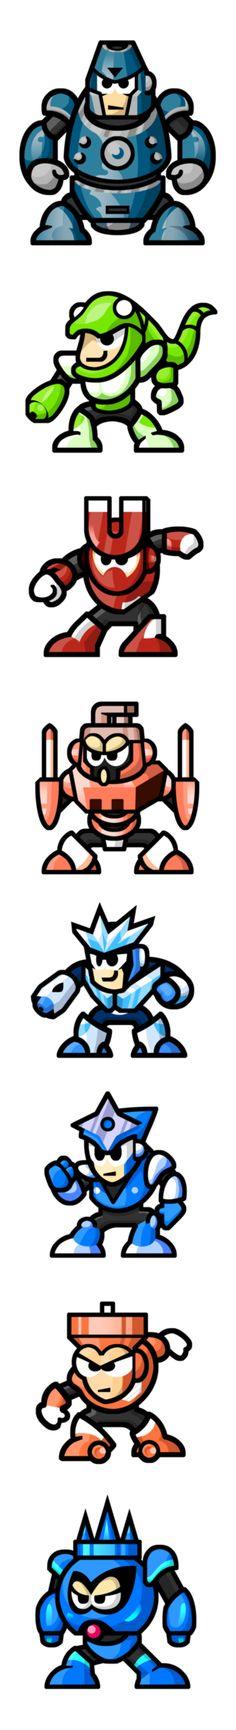 "MegaMan ""Sprites""-Bosses of 3 by WaneBlade on DeviantArt"